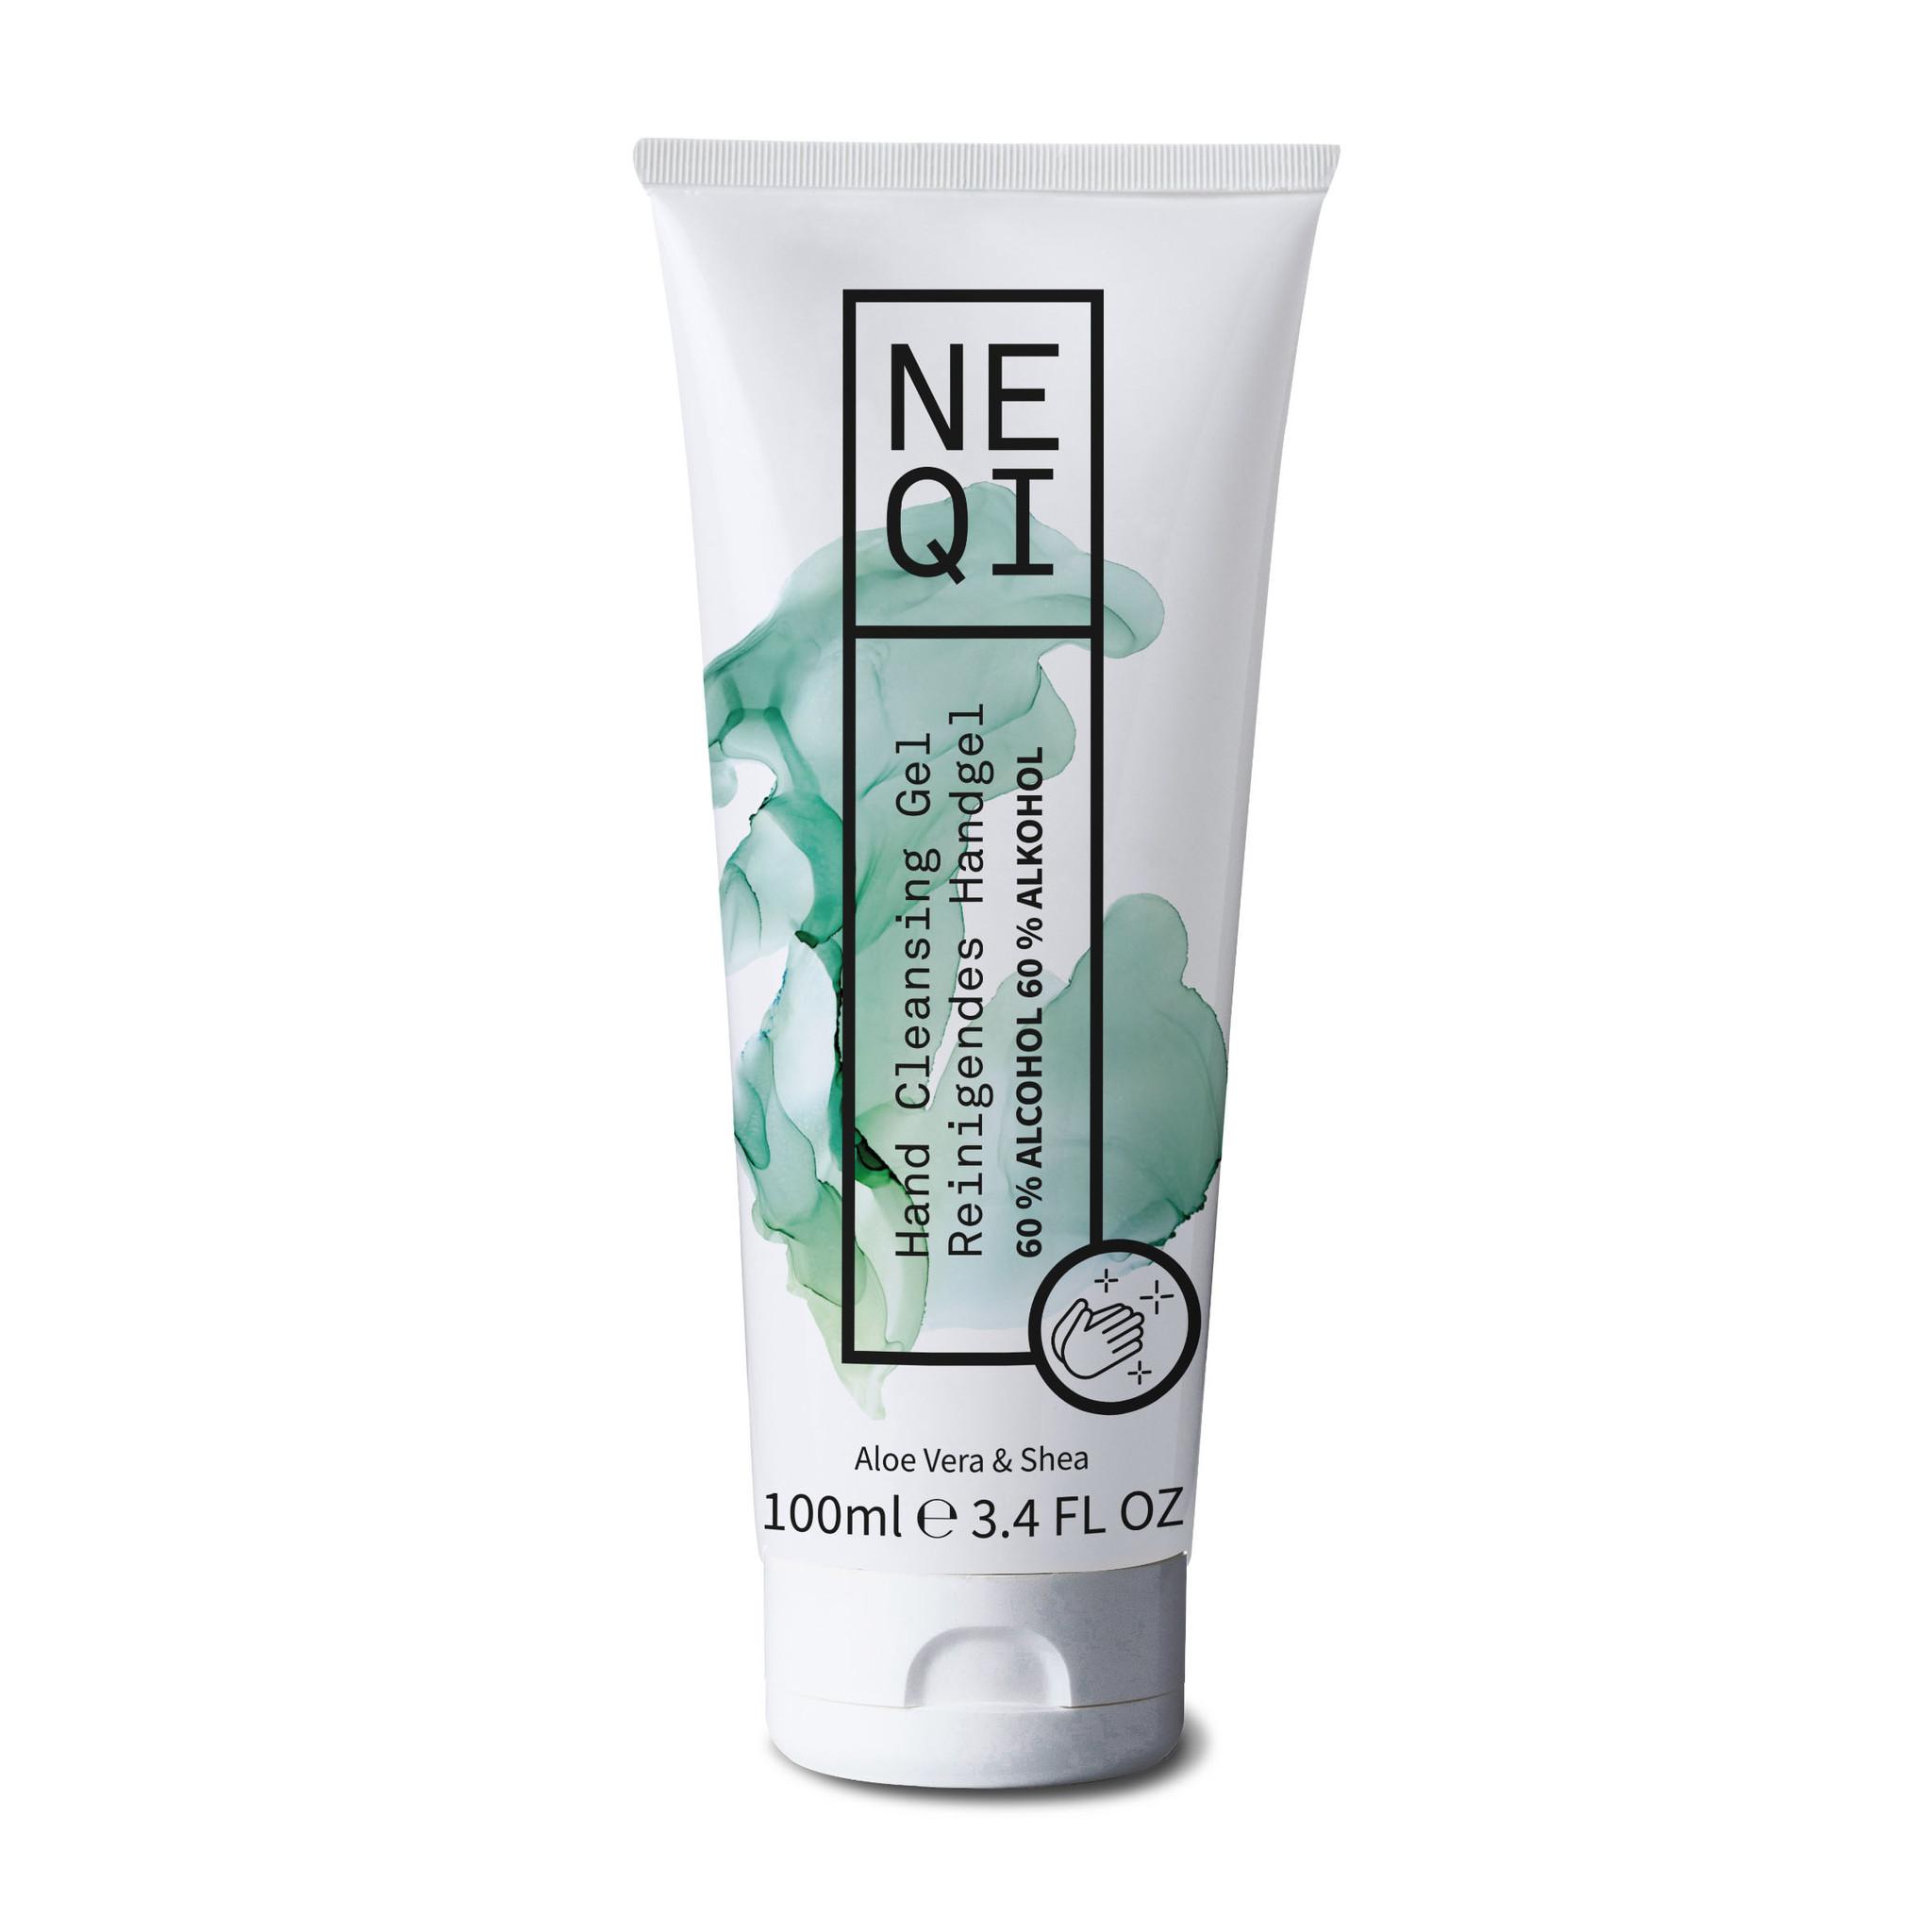 NEQI Hand Cleansing Gel 100ml (Pack of 48)